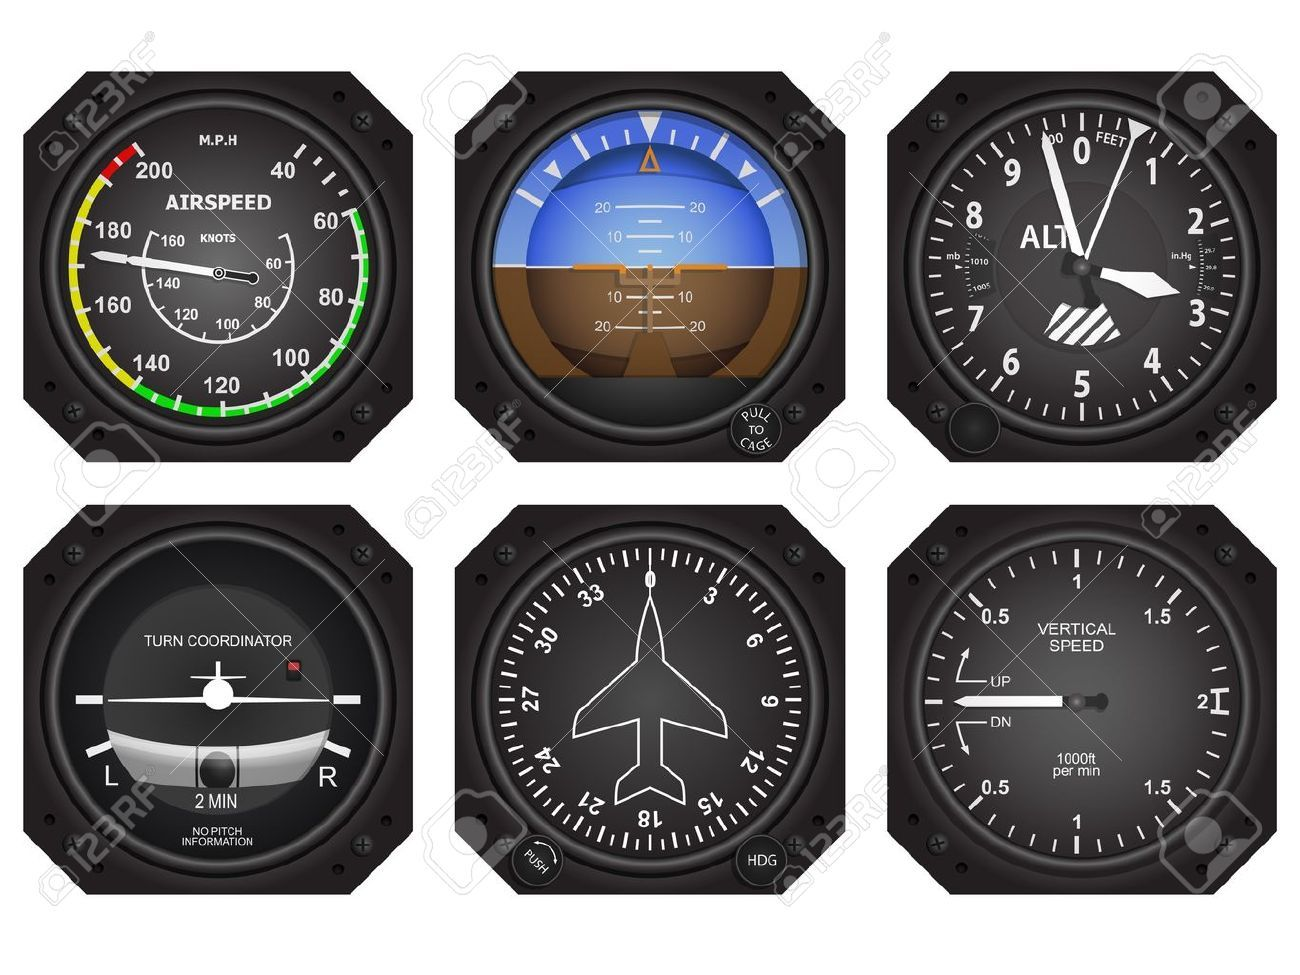 Aircraft Avionics Instruments     | Cuttlebug cards